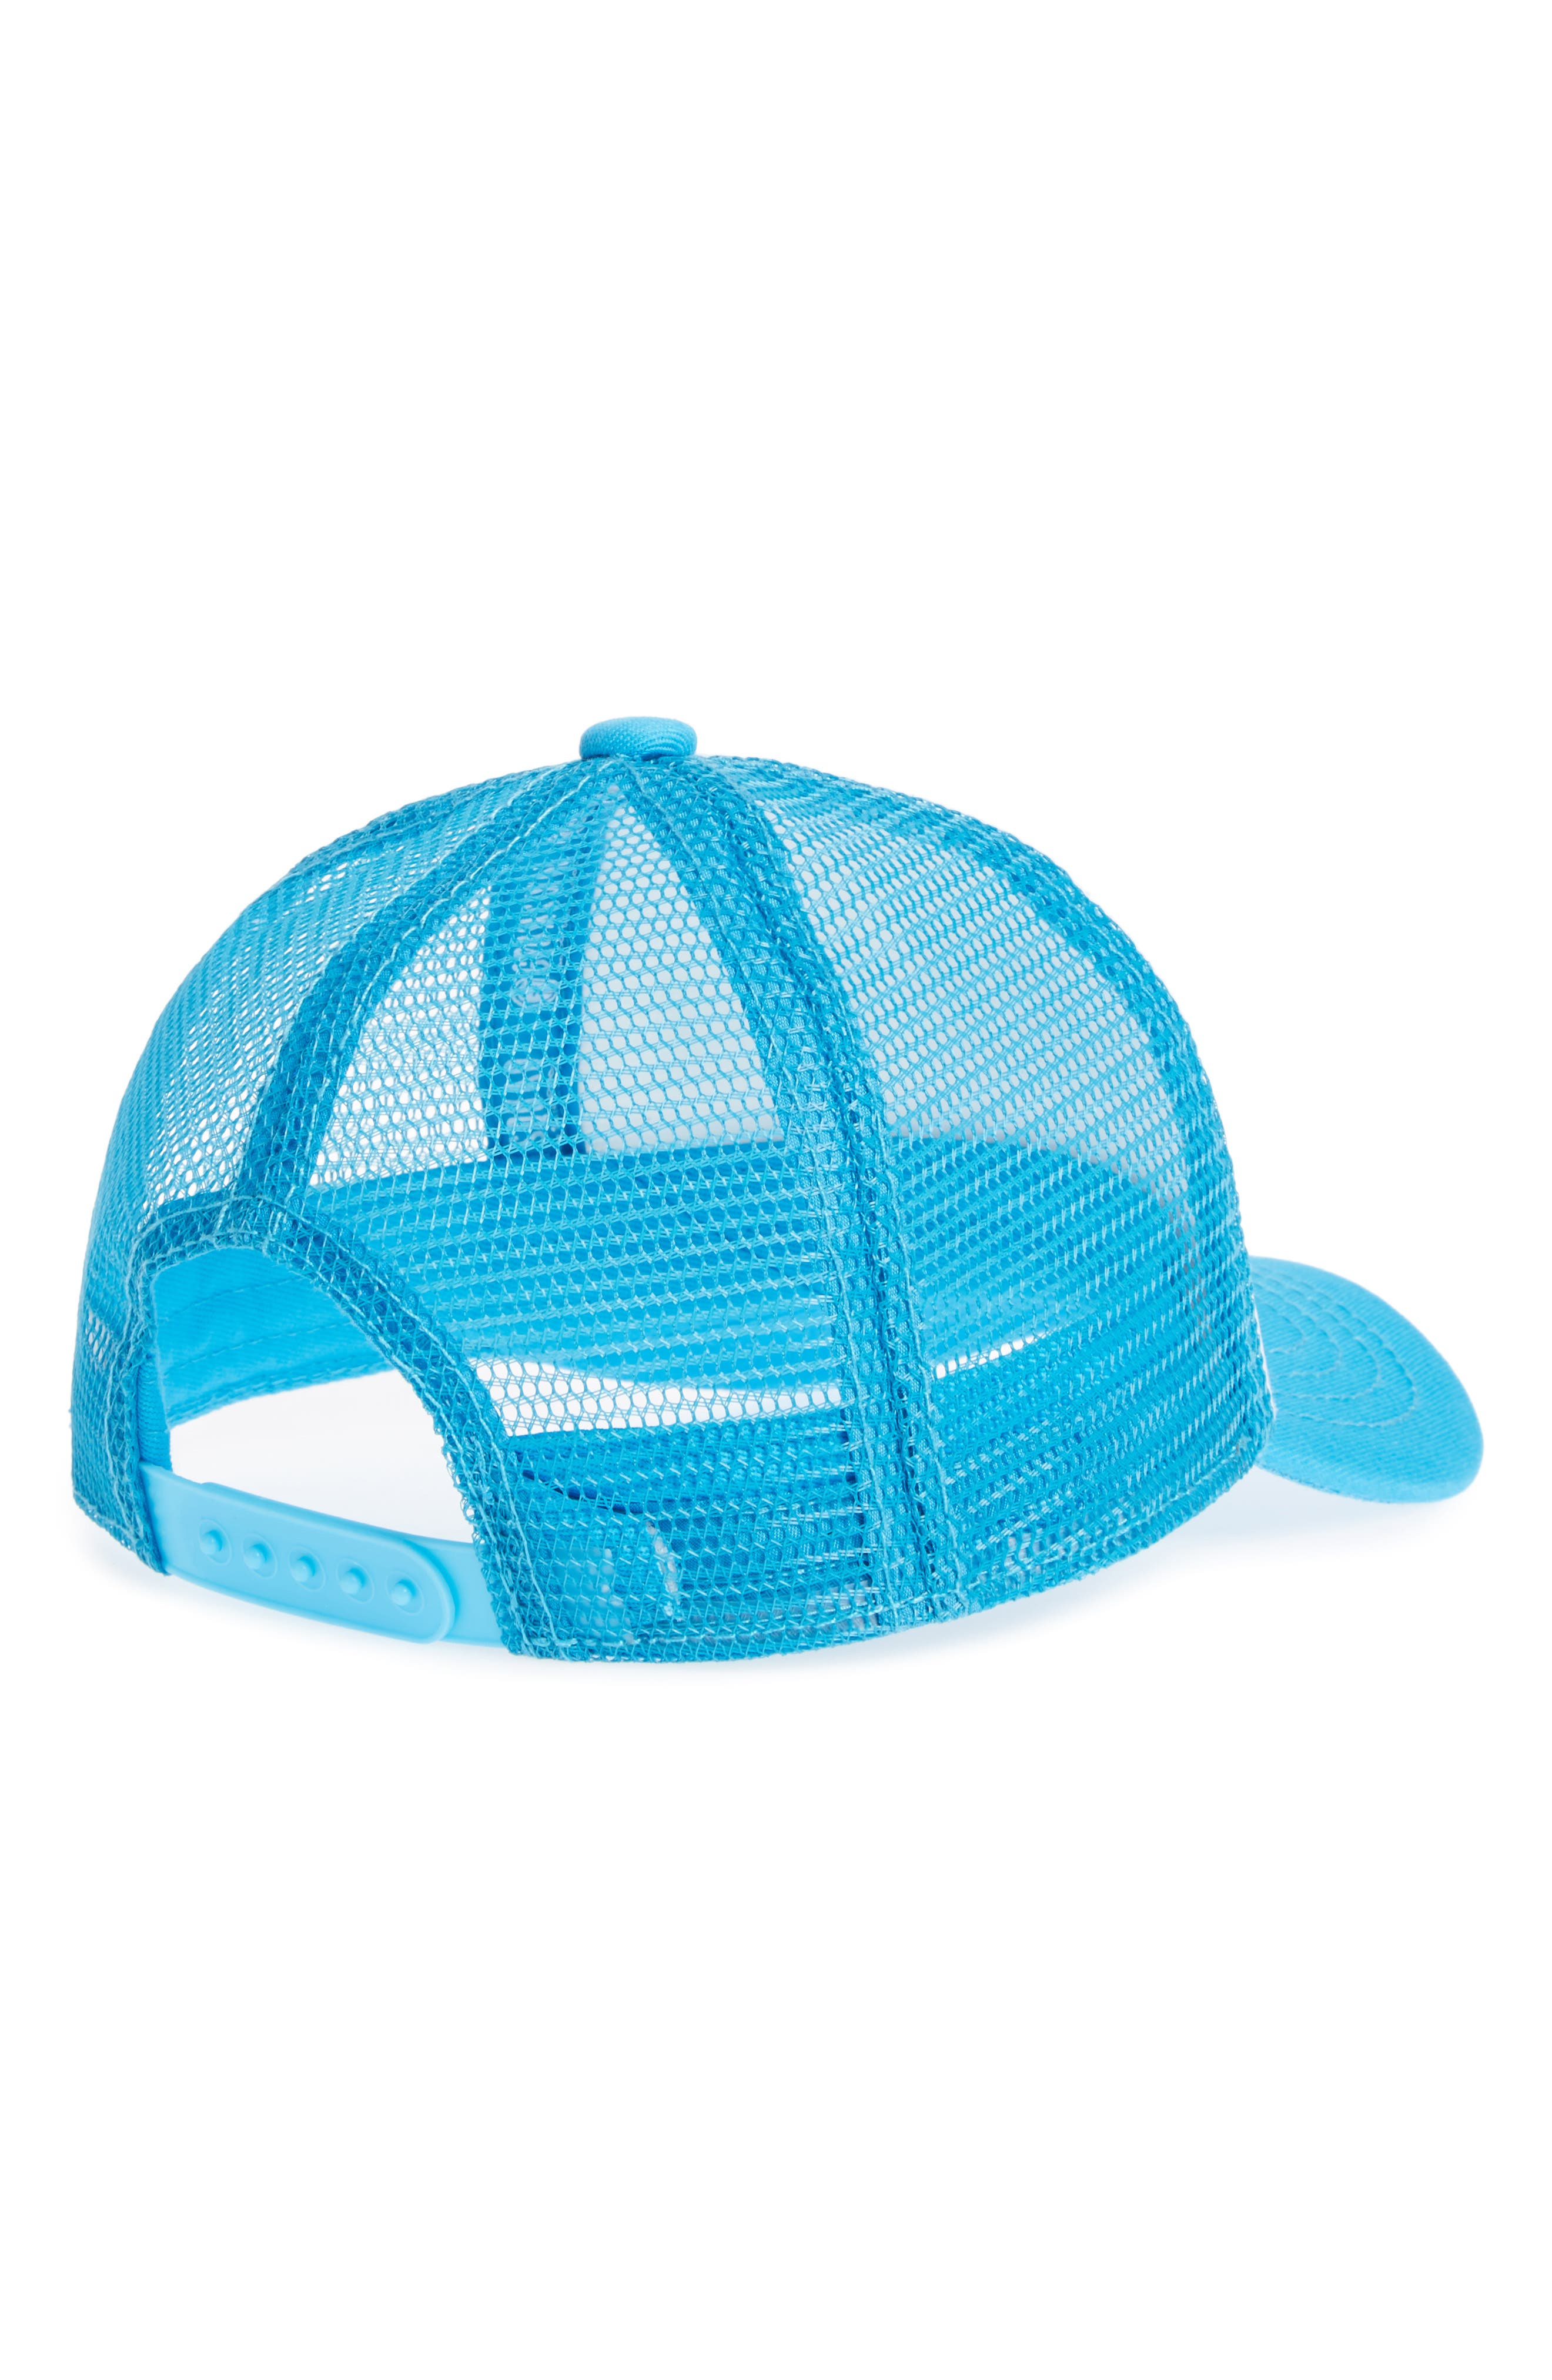 Trucker Hat,                             Alternate thumbnail 2, color,                             AQUA/ WHITE MERMAID HAIR